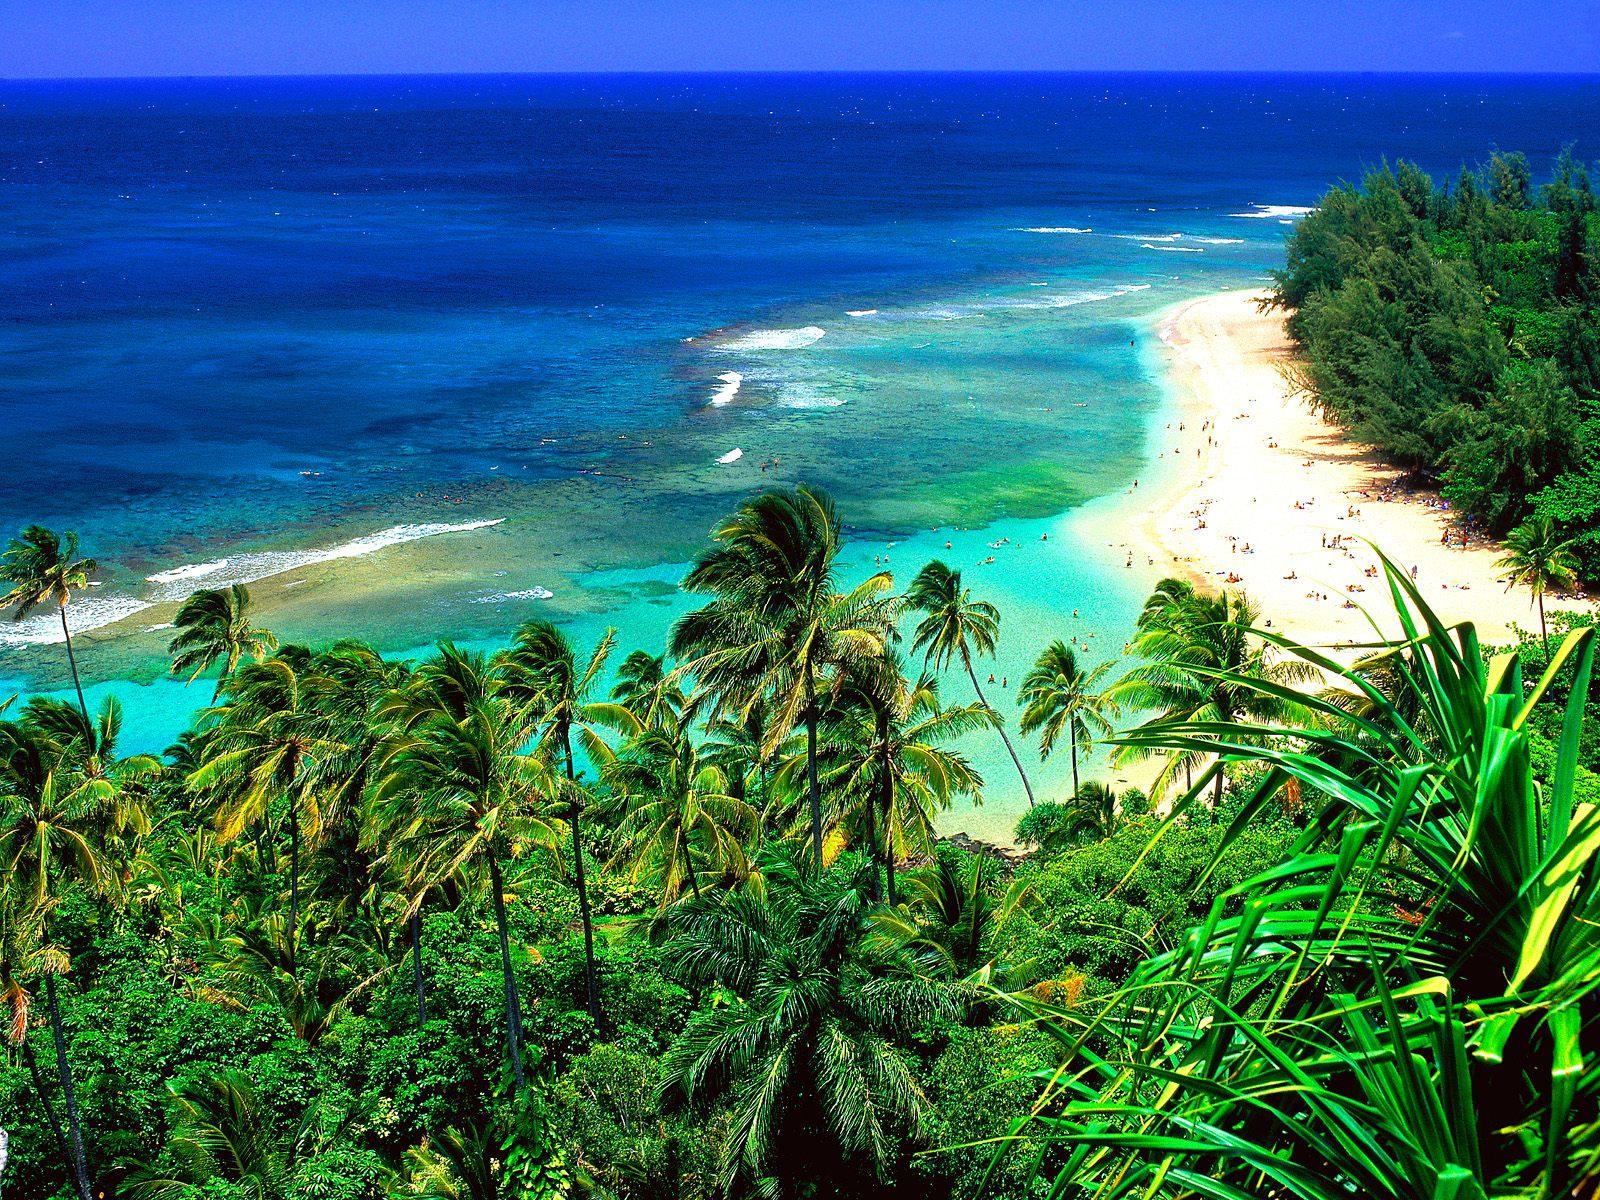 diaforetiko.gr : kauai+island+%281%29 Τα 30 ομορφότερα νησιά του κόσμου – Ανάμεσα τους και η δική μας Σαντορίνη!